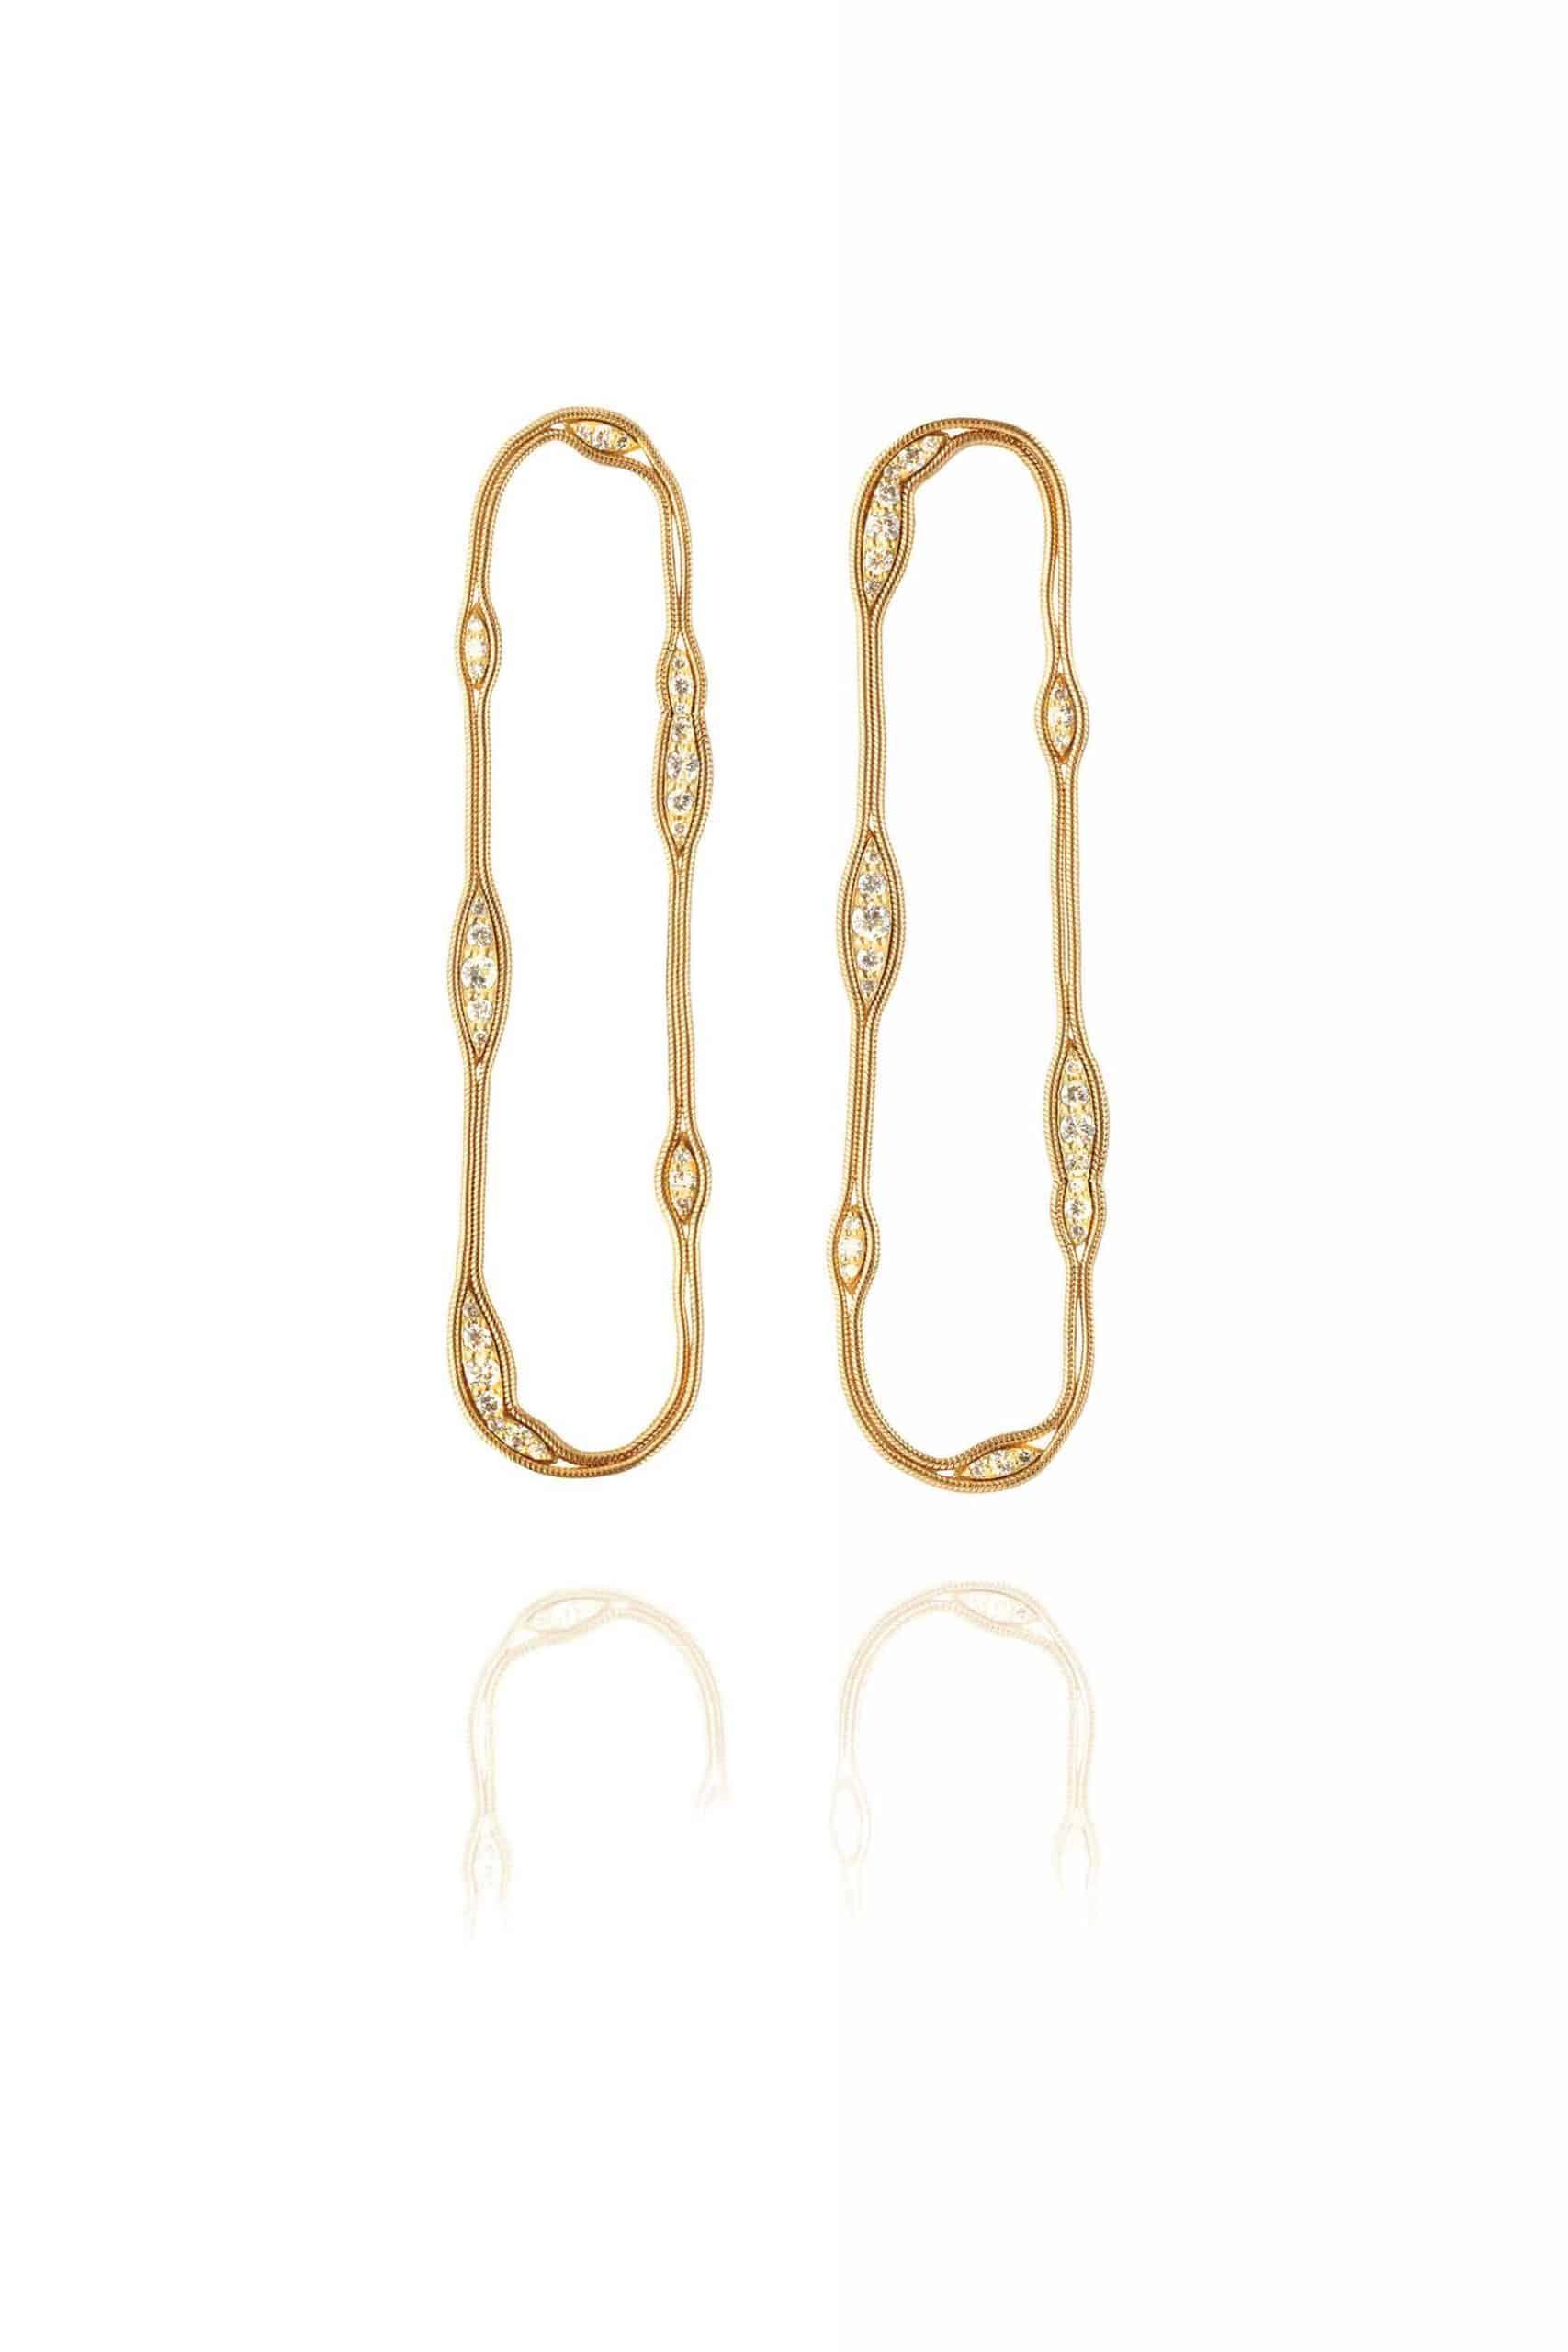 Fluid Diamonds Cycle Earrings